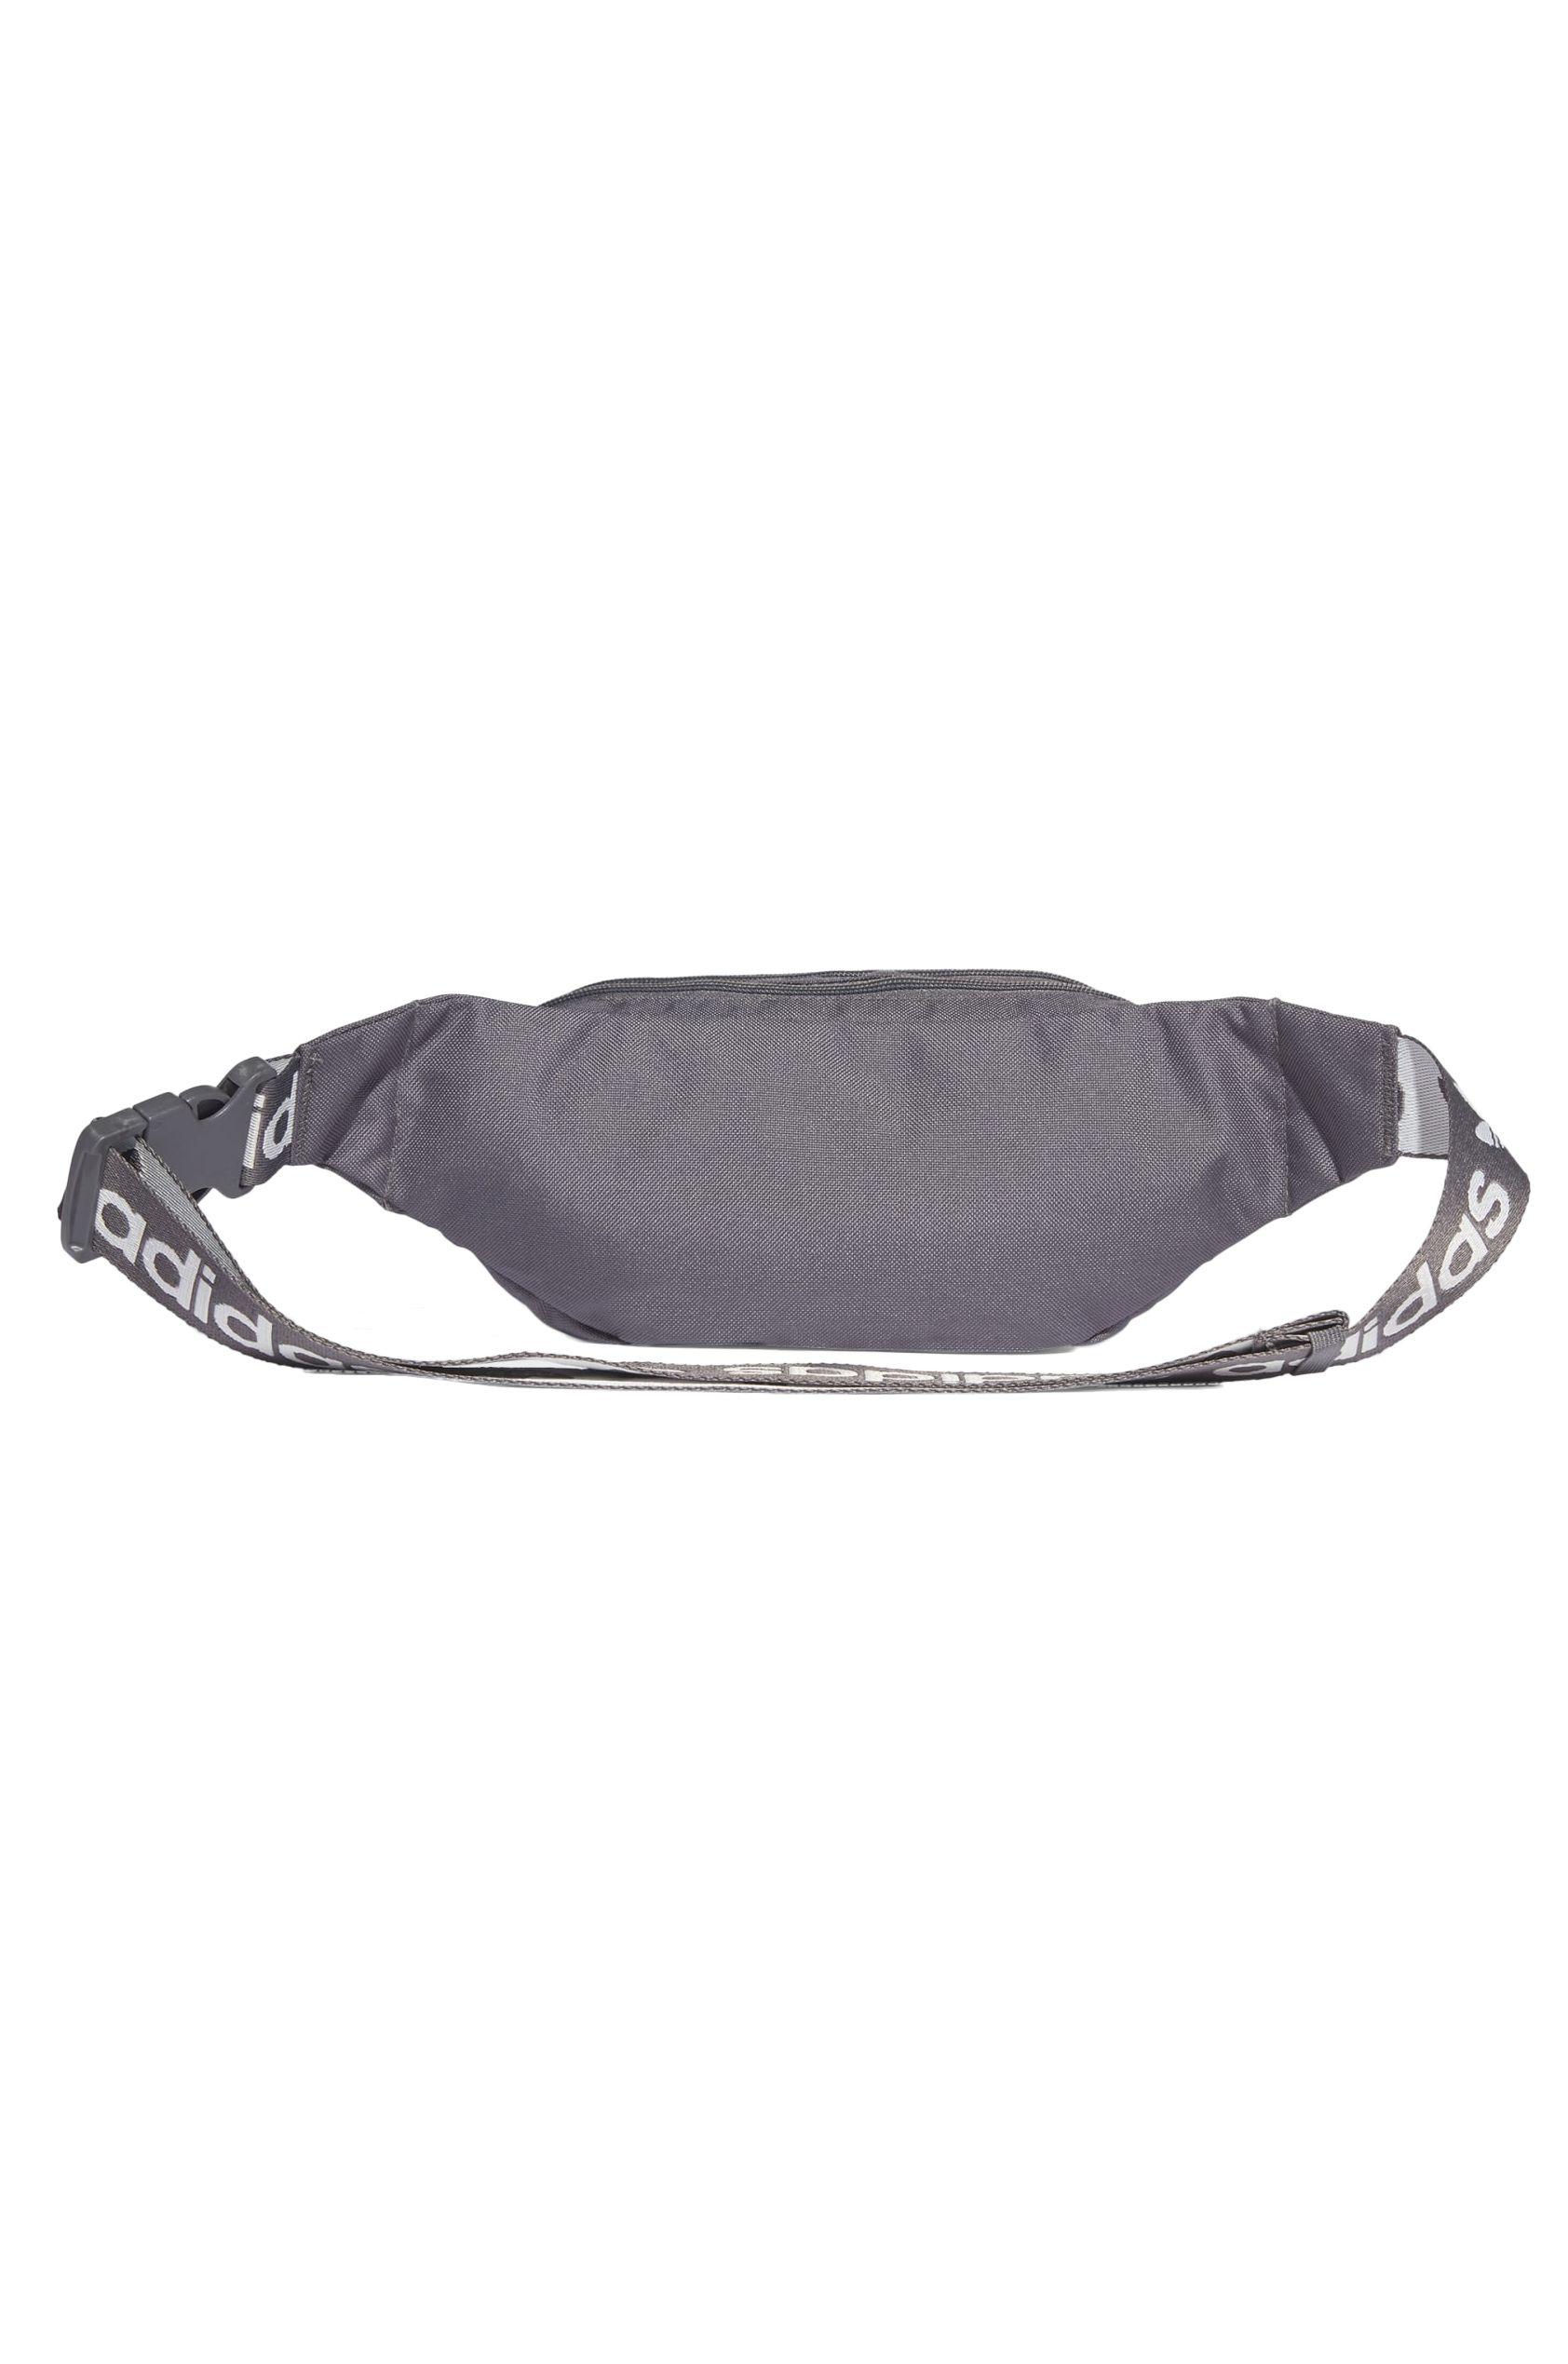 Adidas Waist Bag ADICOLOR WAISTB Greyfive